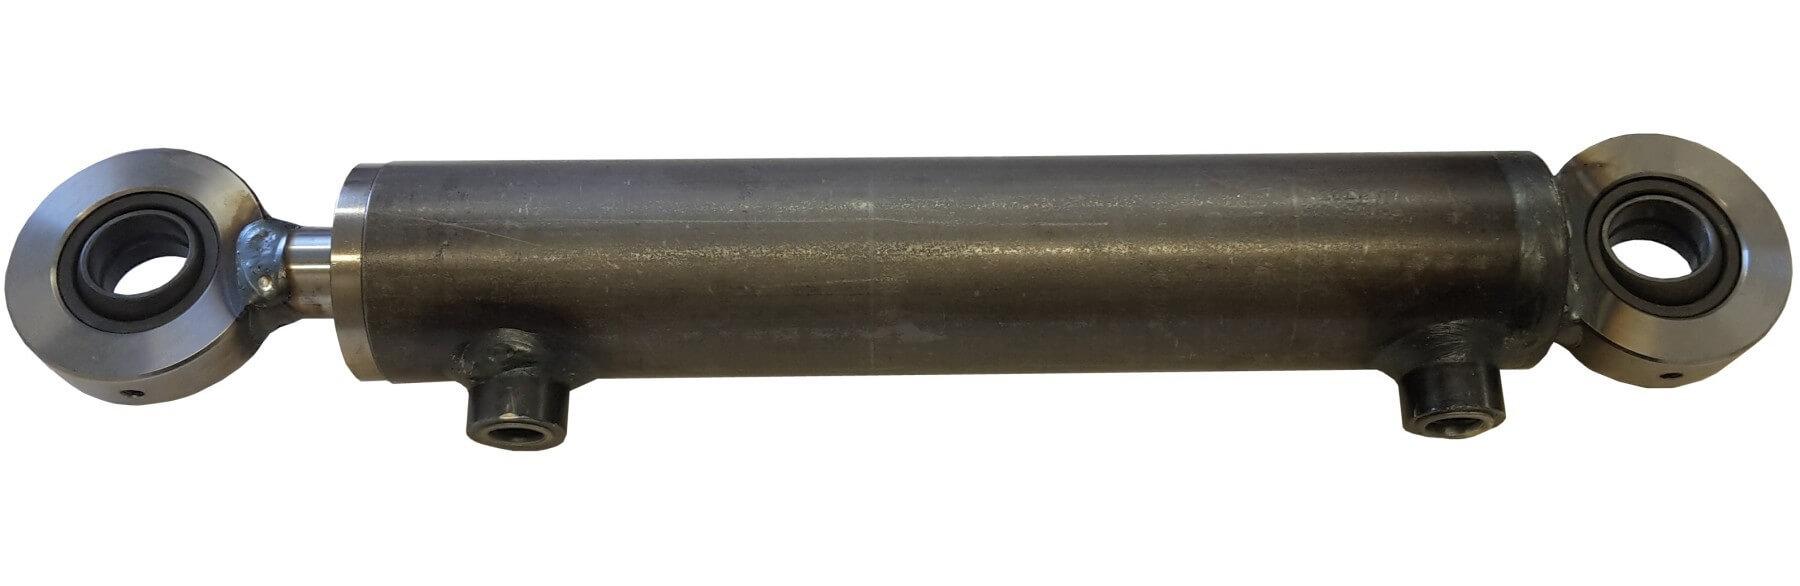 Hydraulisylinteri CL 40. 20. 200 GE